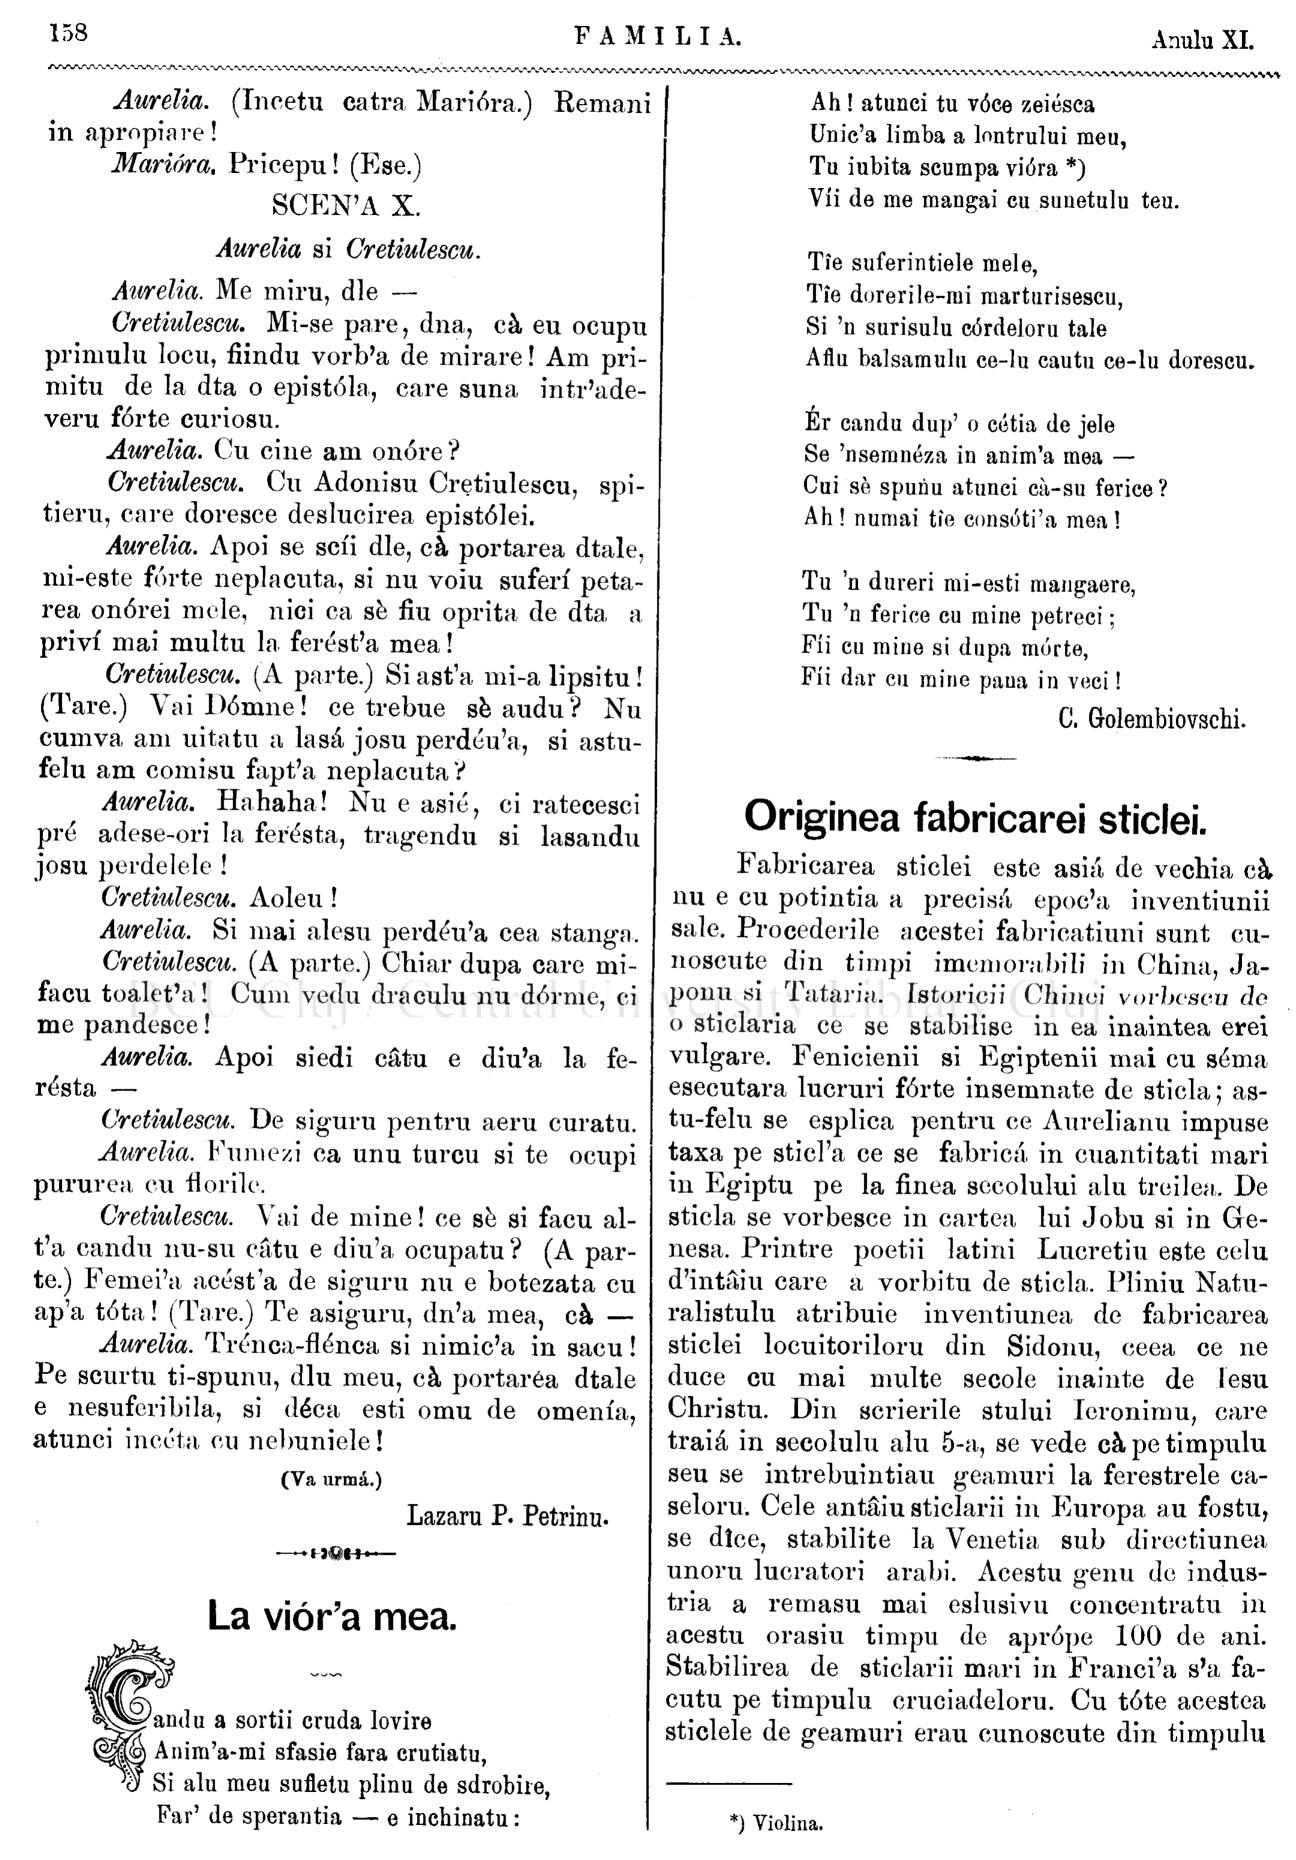 Debutul literar al lui Ciprian Golembiovschi-Porumbescu